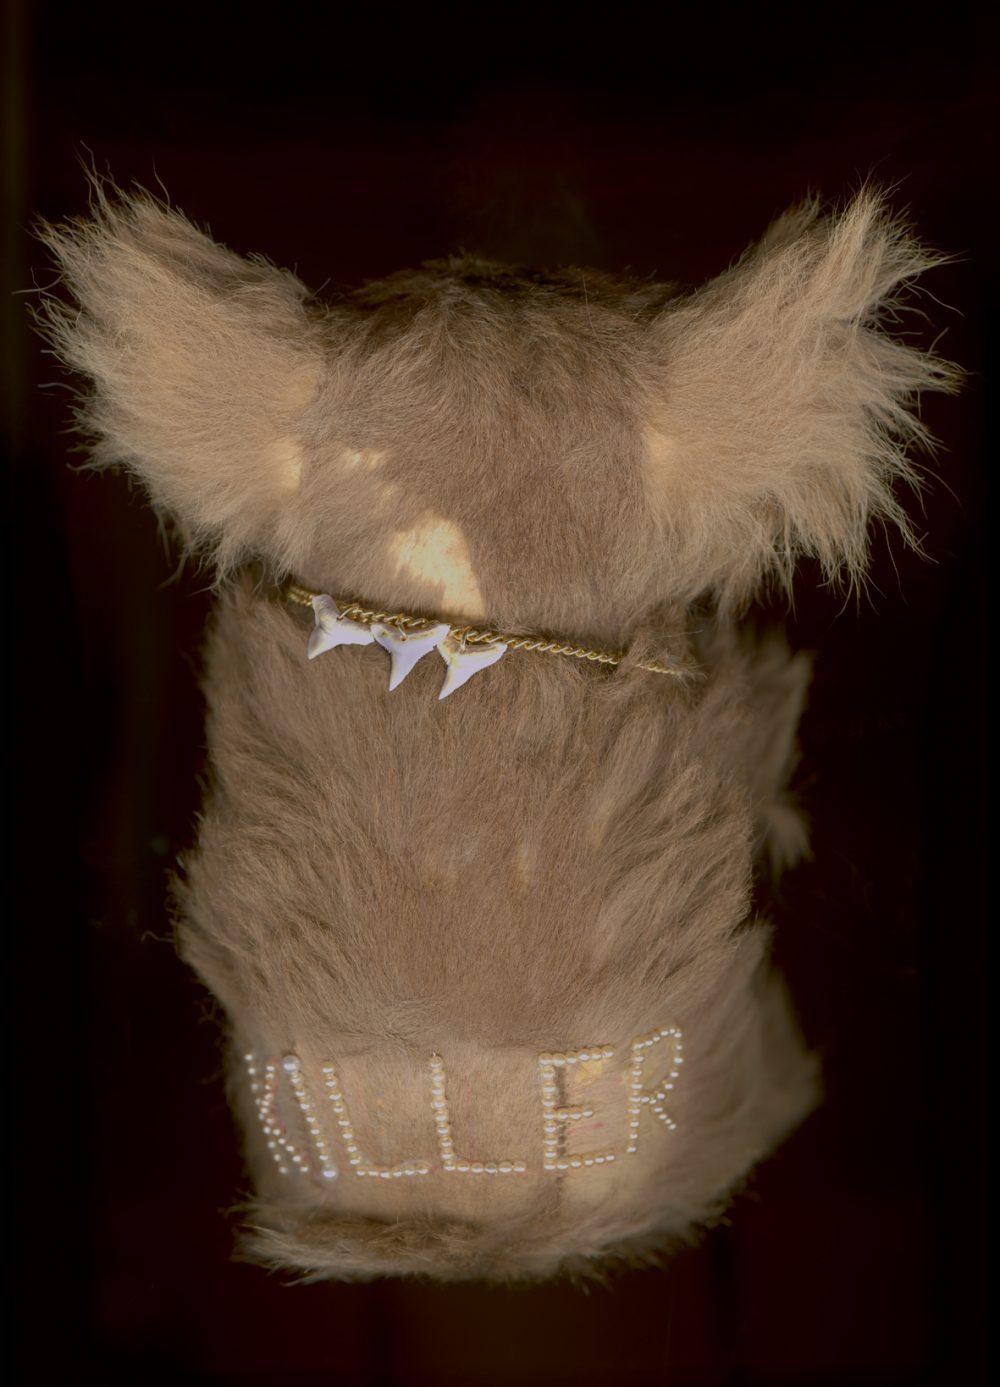 Worry Dolls: Killer (2010), Archival ink auf Fotopapier, 60 x 40 cm, Ed. 5